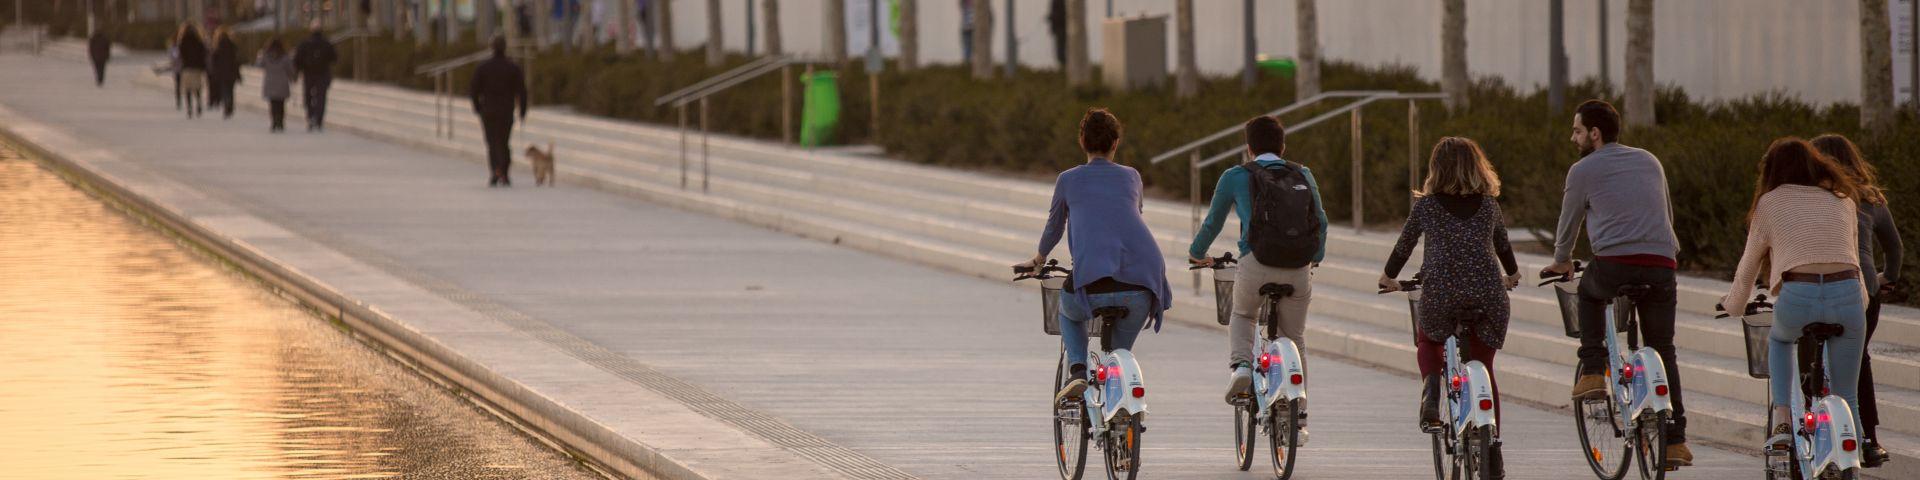 Sustainable Mobility - Εικόνα